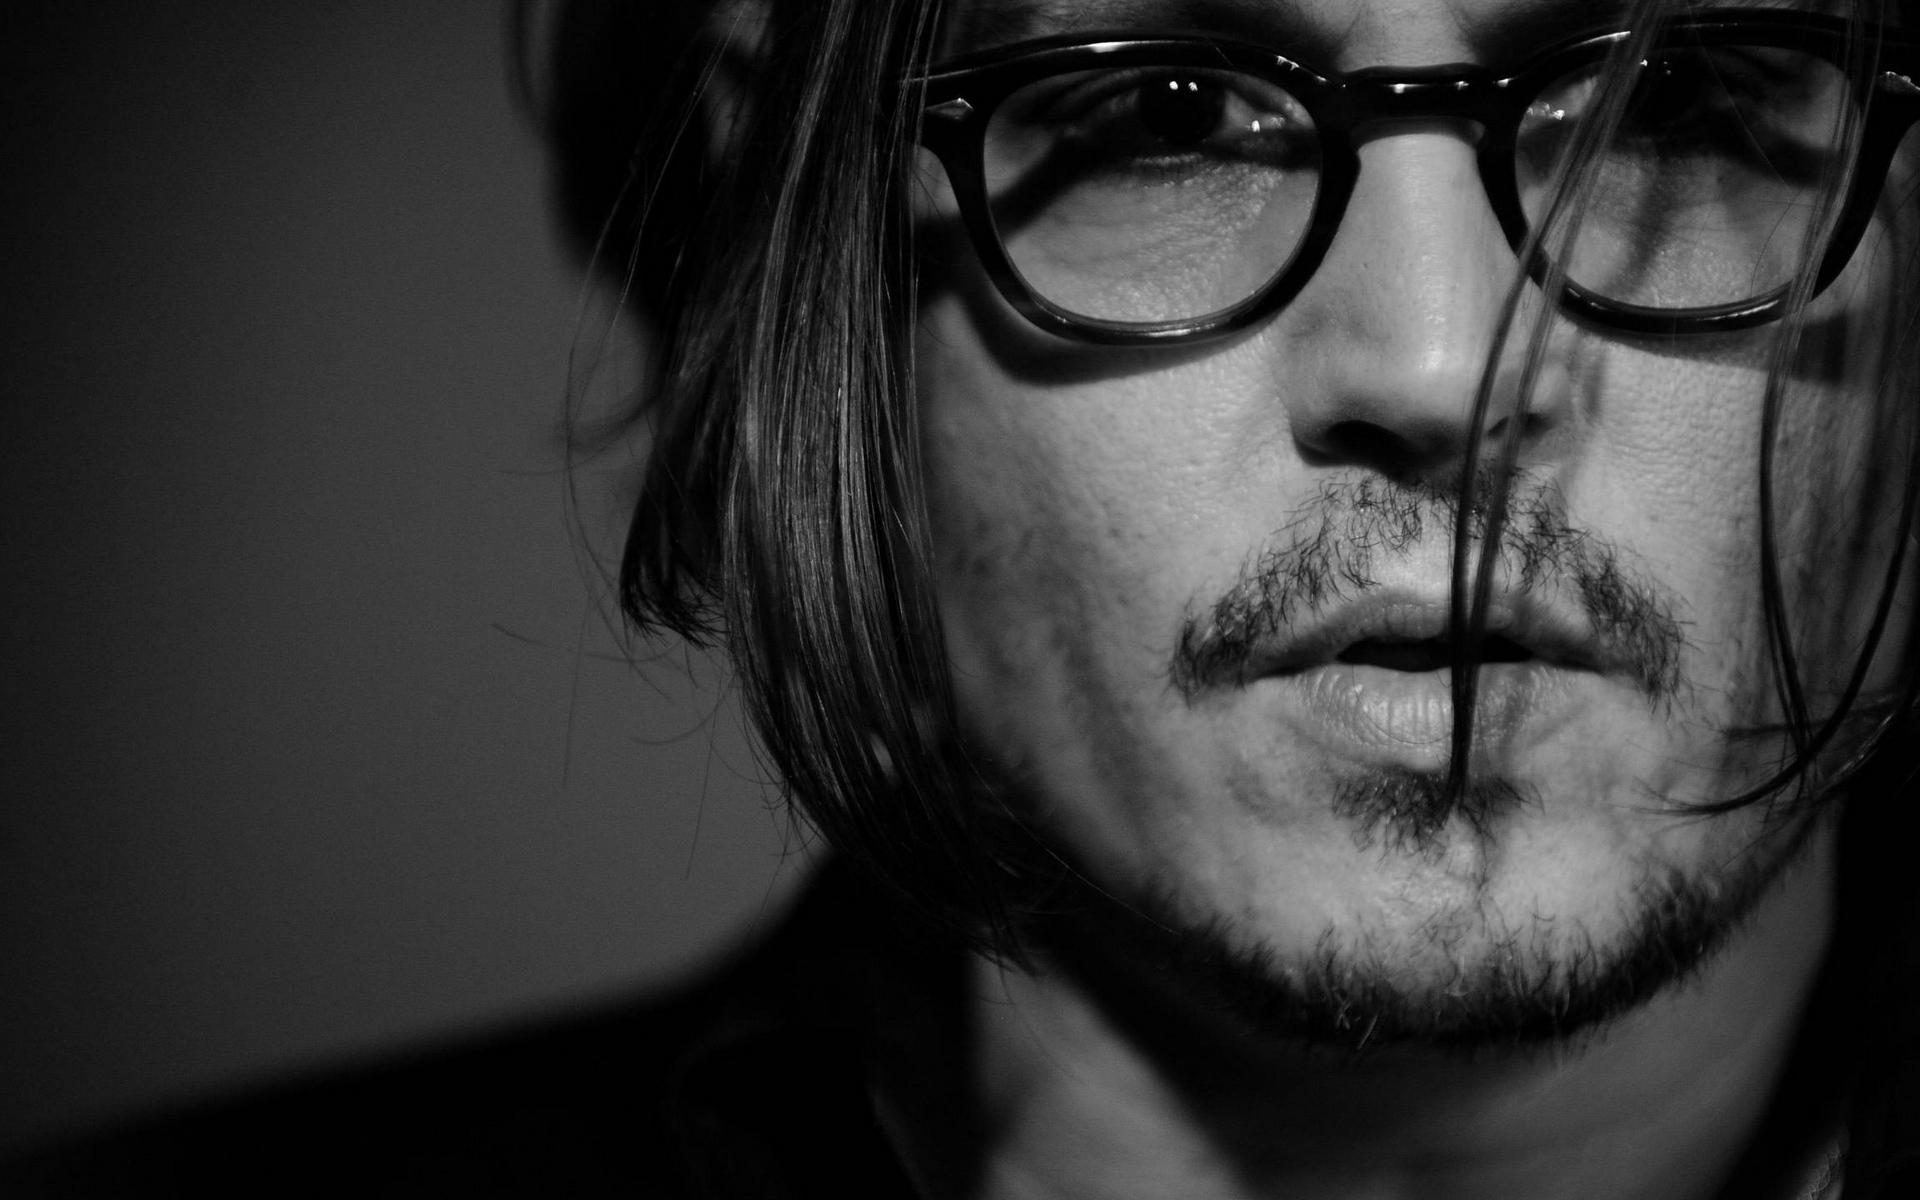 обои Джонни Депп, актер, прическа, очки картинки фото